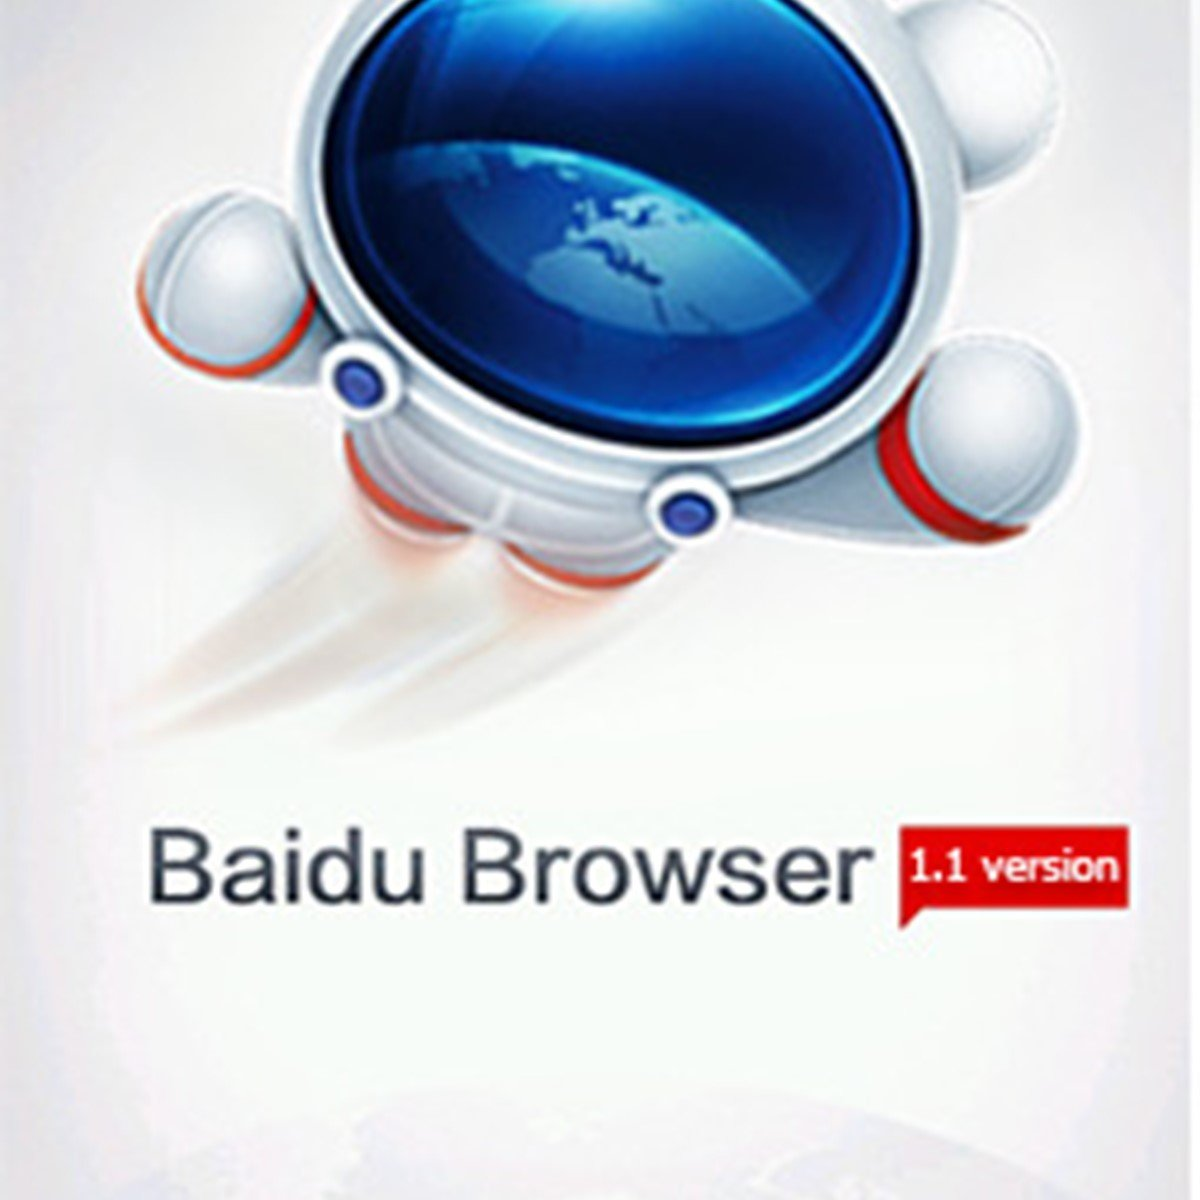 Baidu Browser Alternatives and Similar Apps - AlternativeTo net